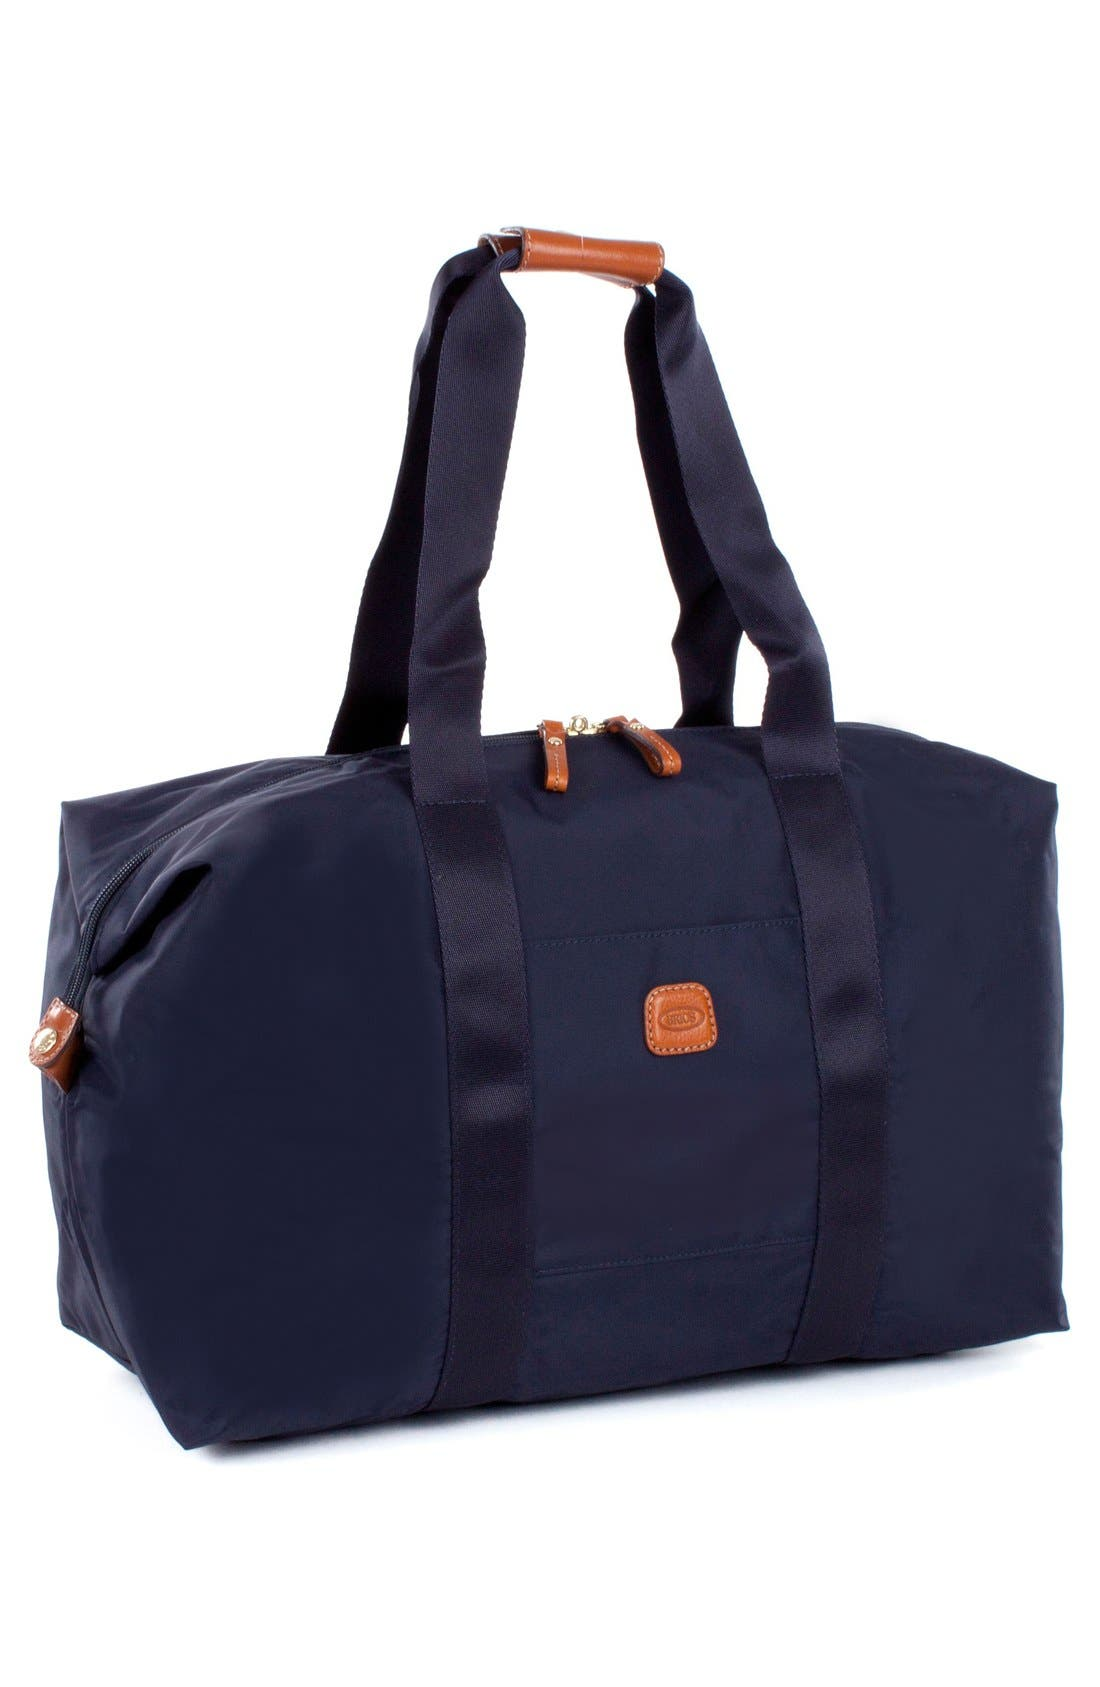 Alternate Image 2  - Bric's 'X-Bag' Folding Duffel Bag (18 Inch)